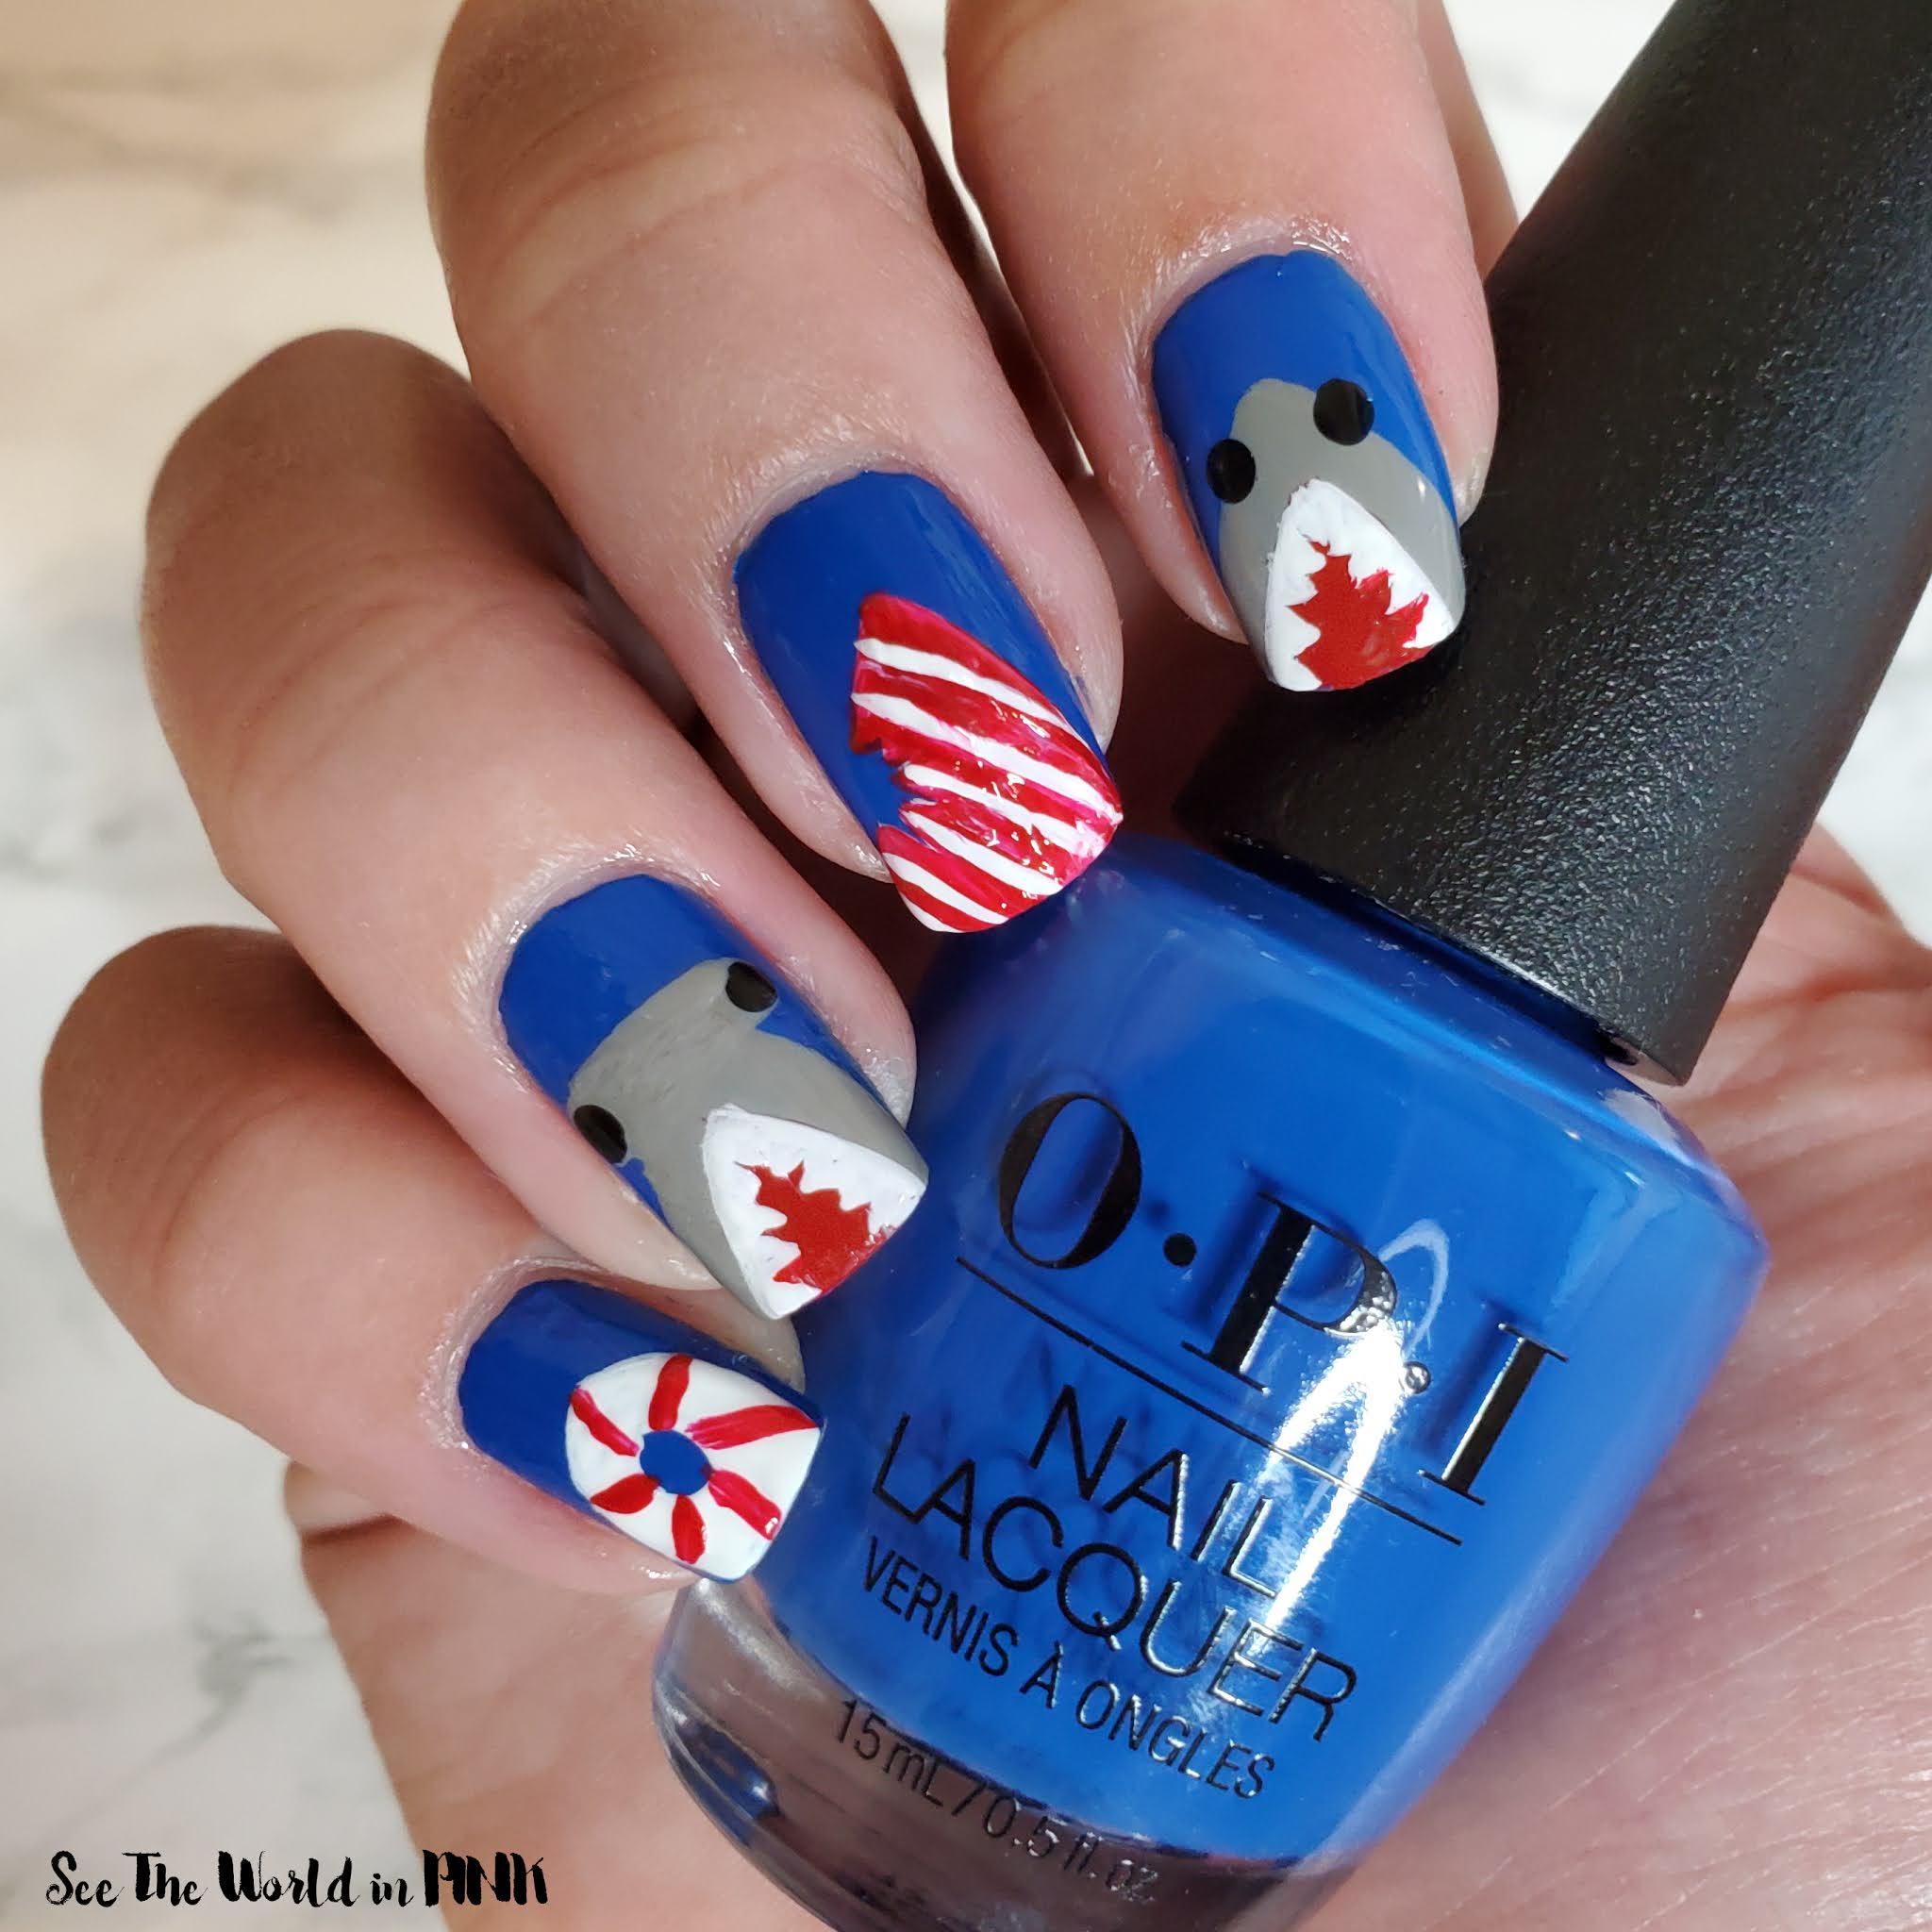 Manicure Monday - Shark Week Nails